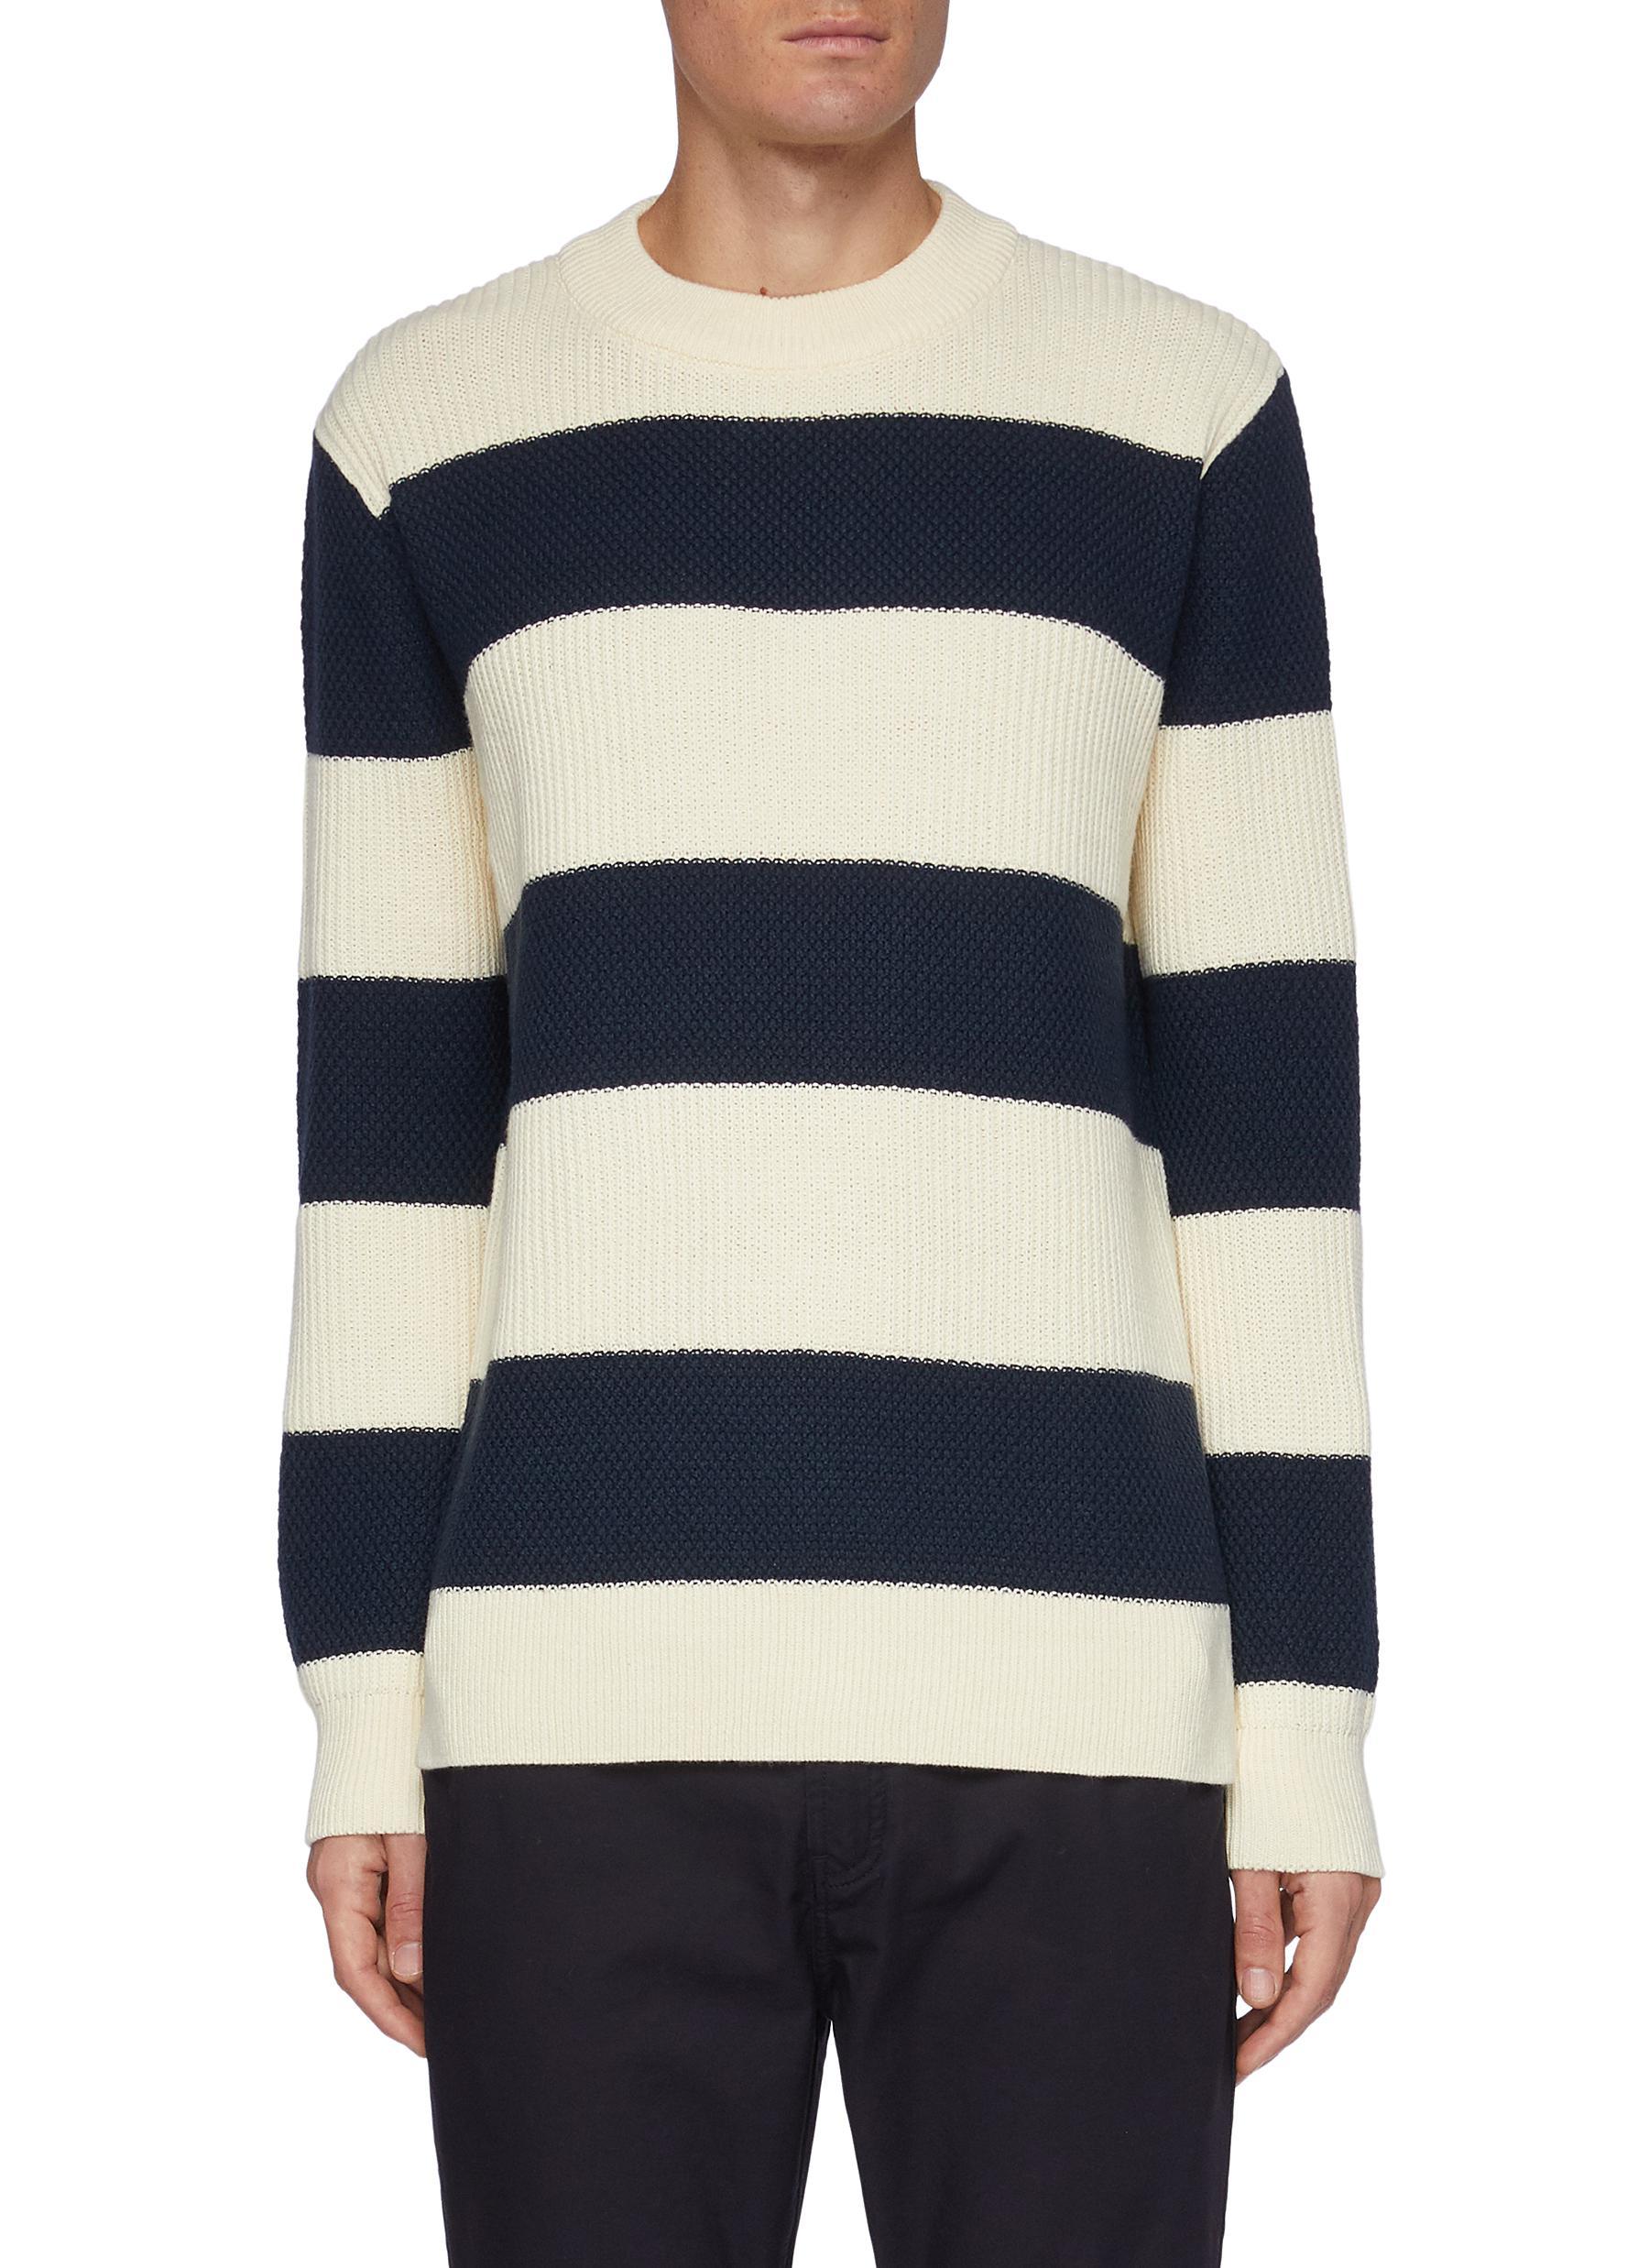 Coldlane' Block Stripe Cotton Blend Sweater - DENHAM - Modalova